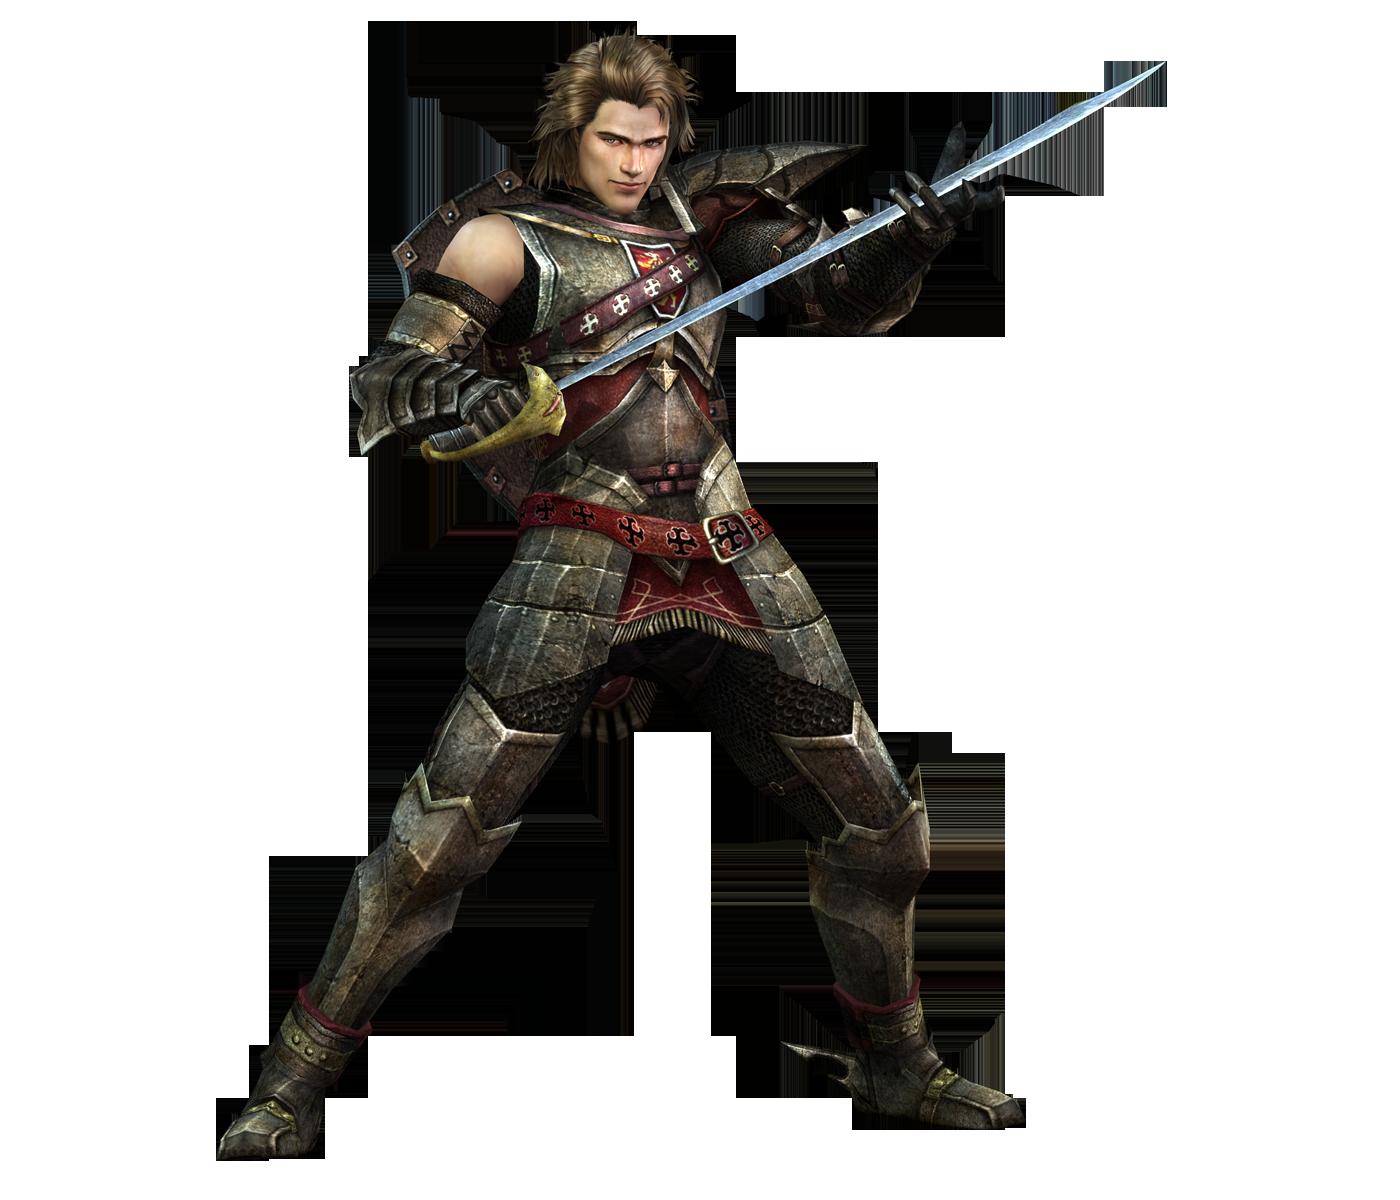 Warriors Orochi 4 Characters List: Dynasty Warriors, Samurai